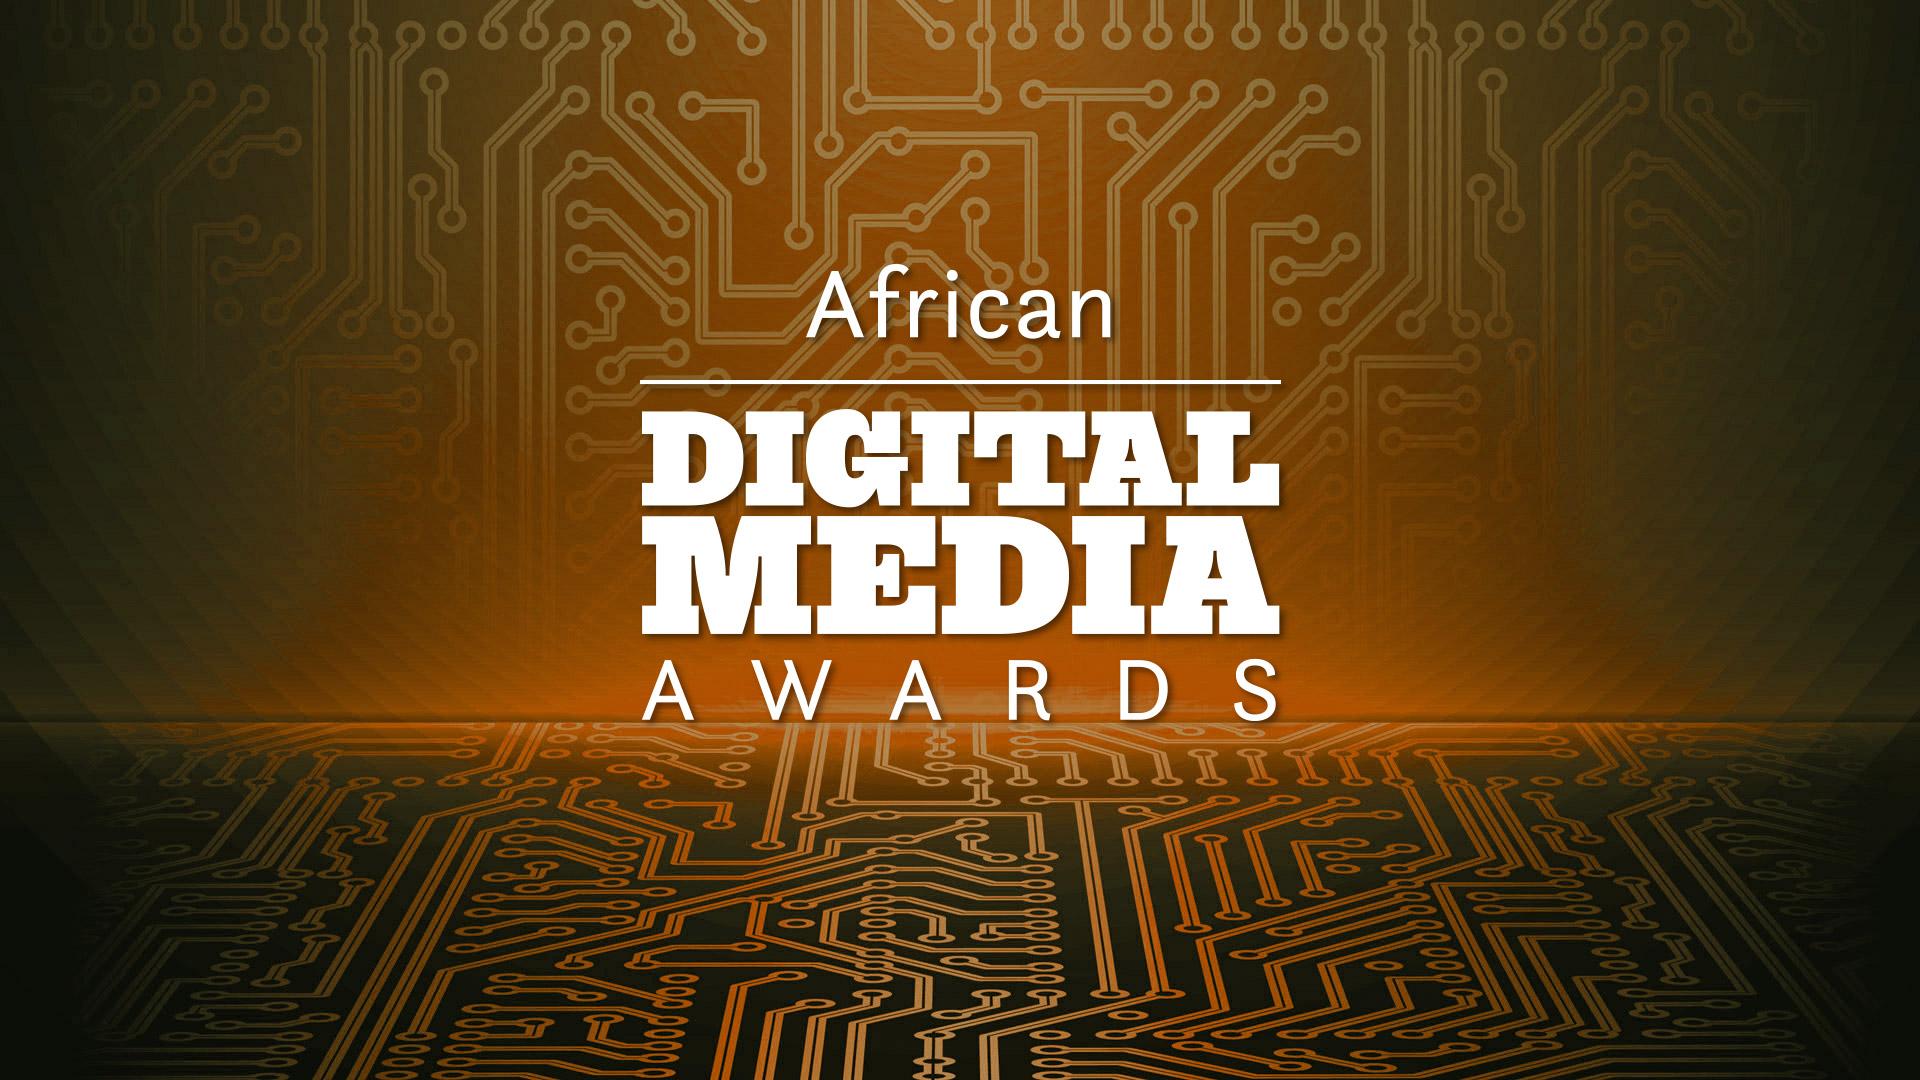 africandma_website_1920x1080.jpg